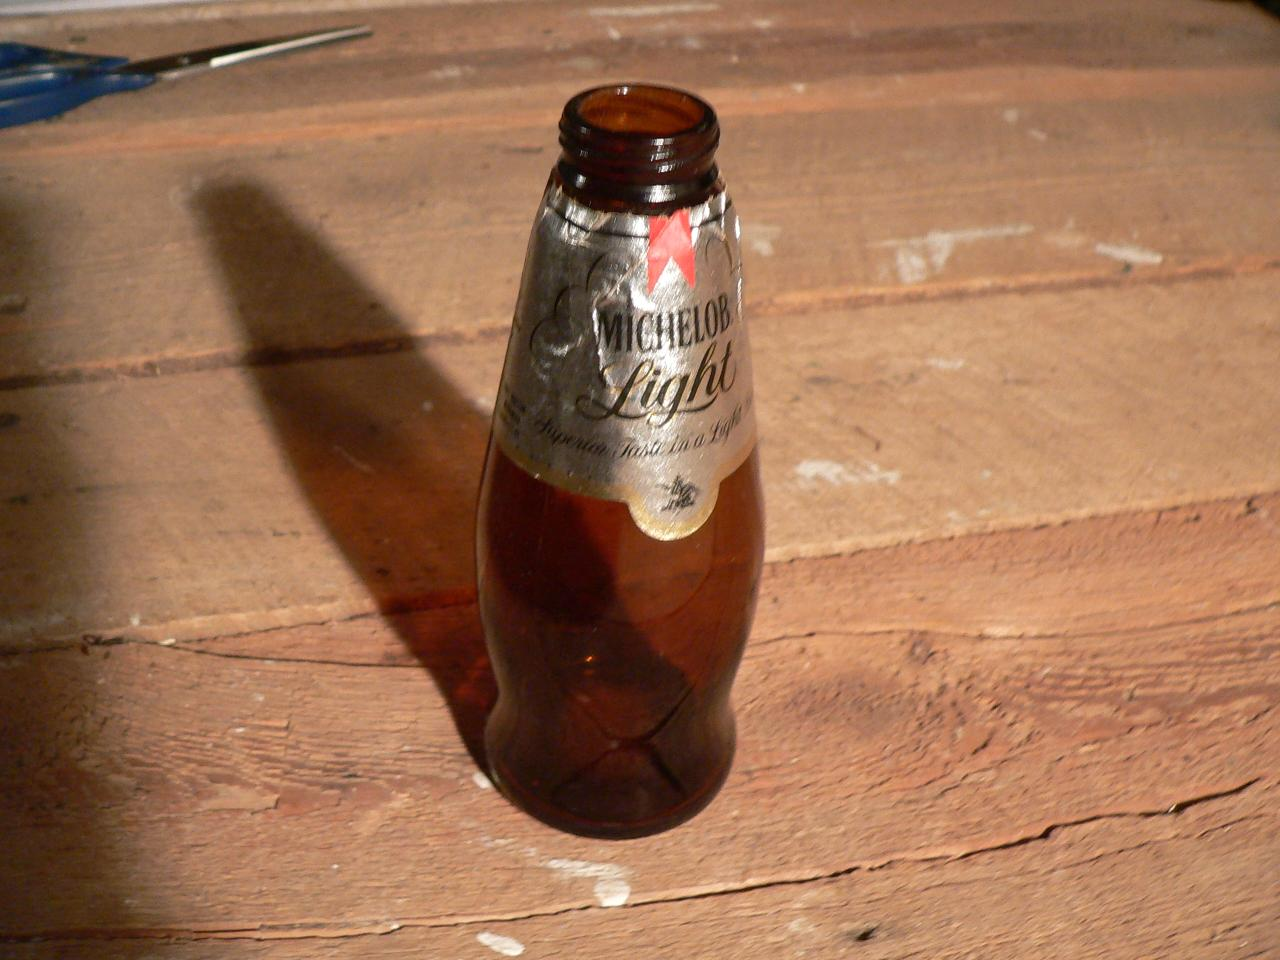 Biere michelob light # 4739.49